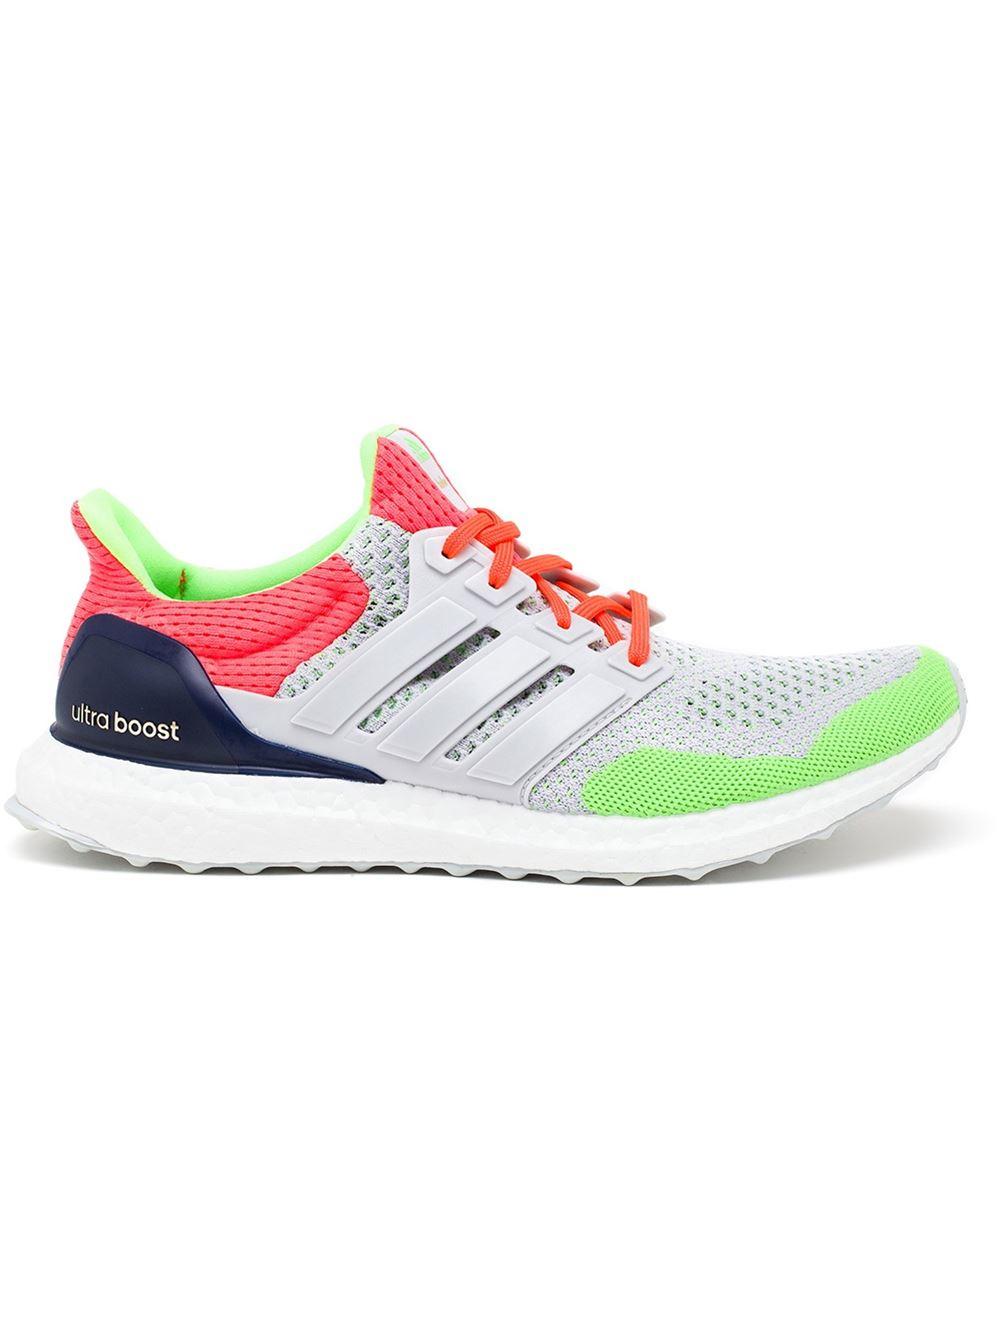 Adidas Originals Adidas By Kolor Ultra Boost Sneakers